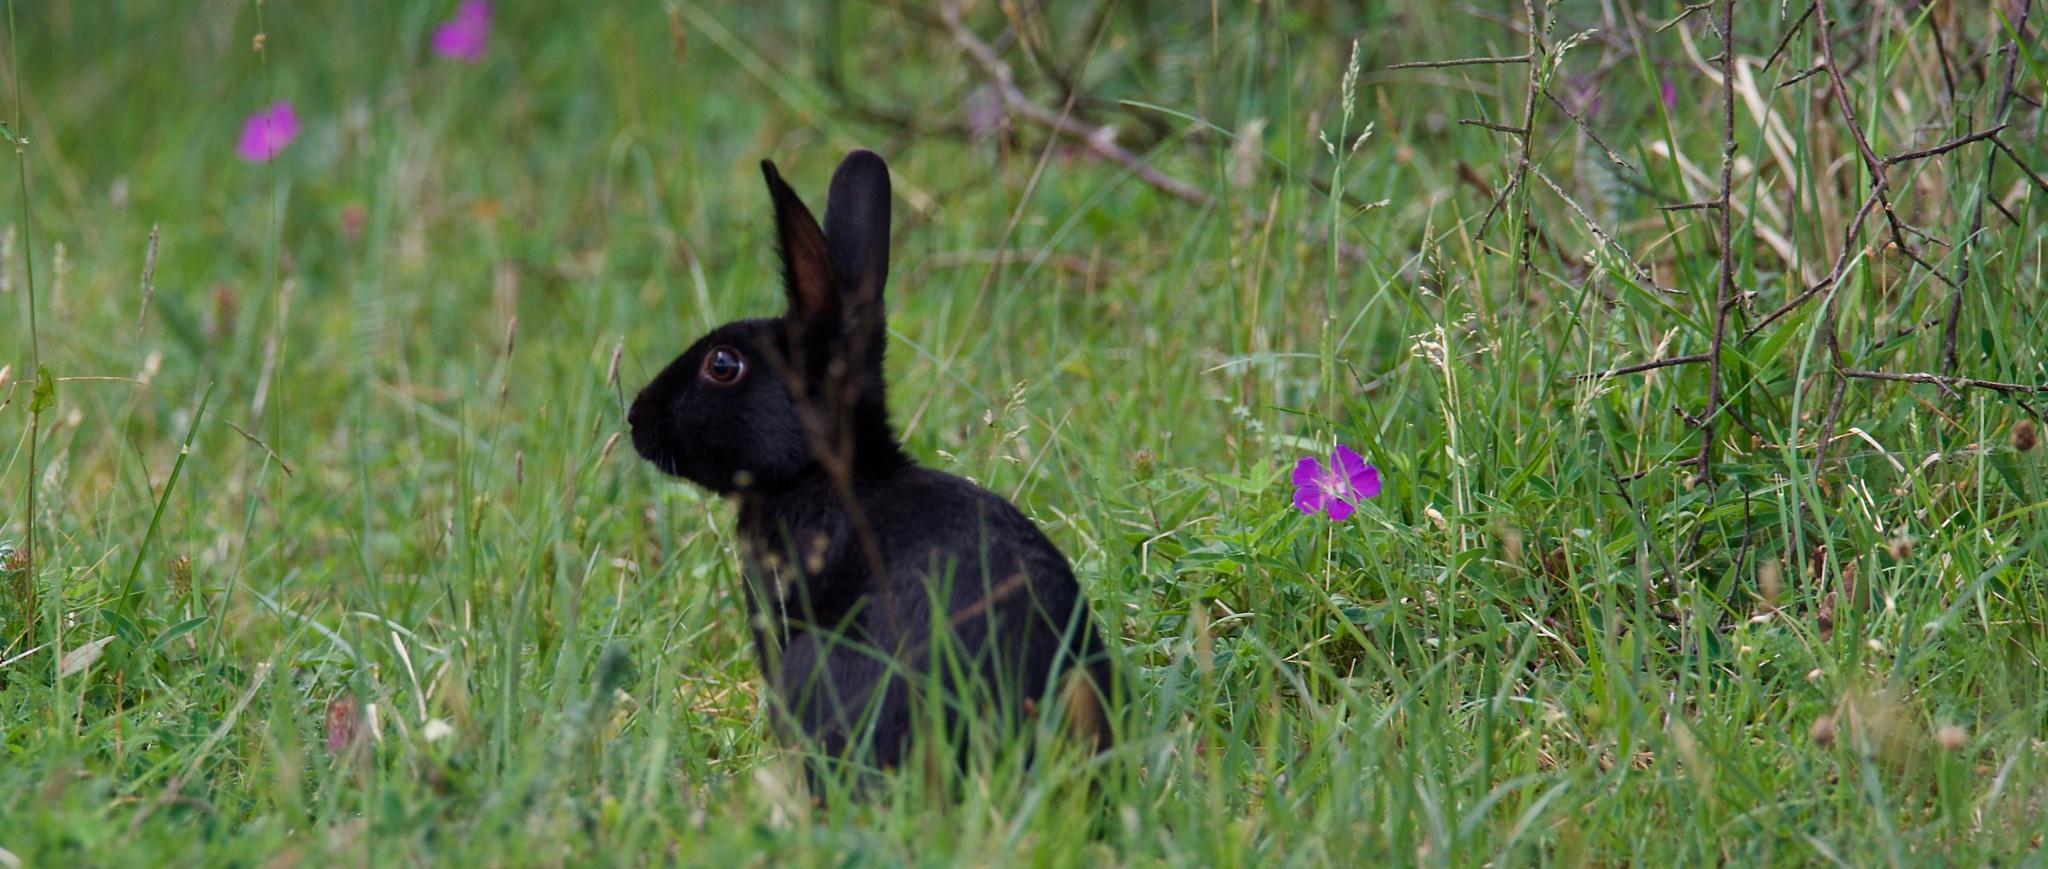 Black rabbit by Michael Pelz